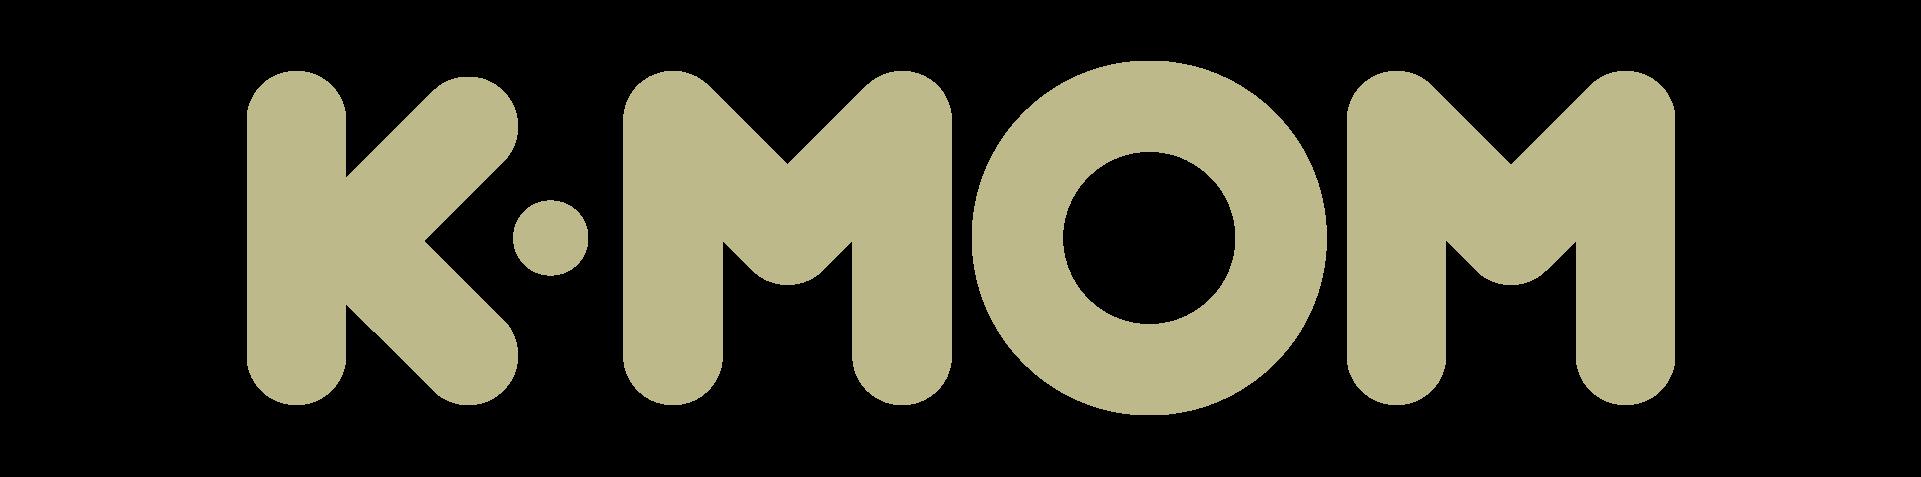 KMOM_PNG